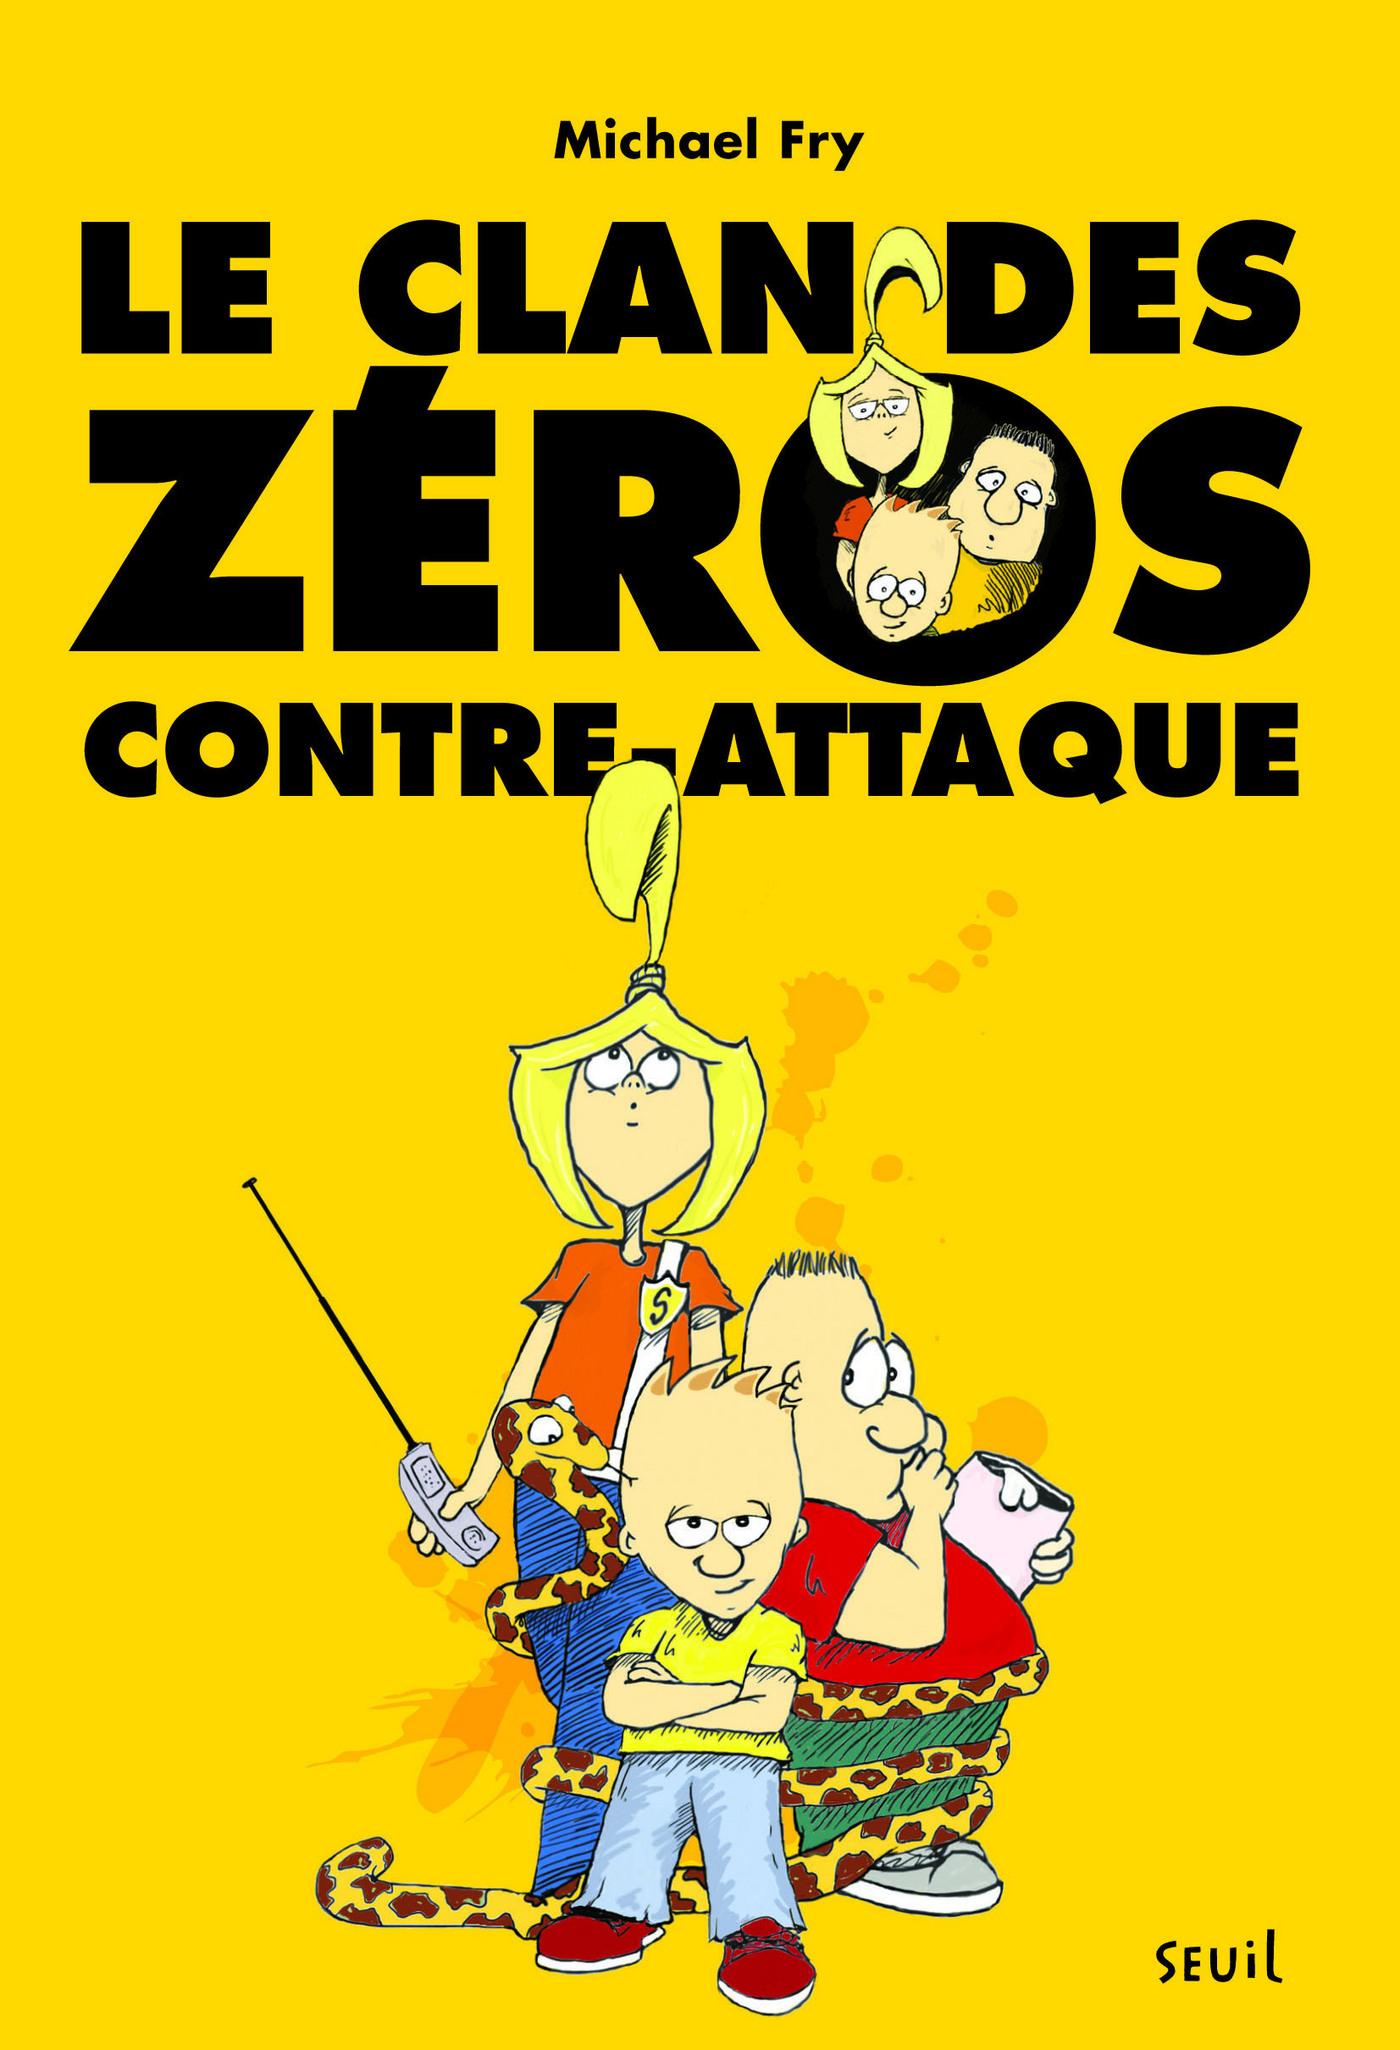 Clan des zéros contre-attaq...